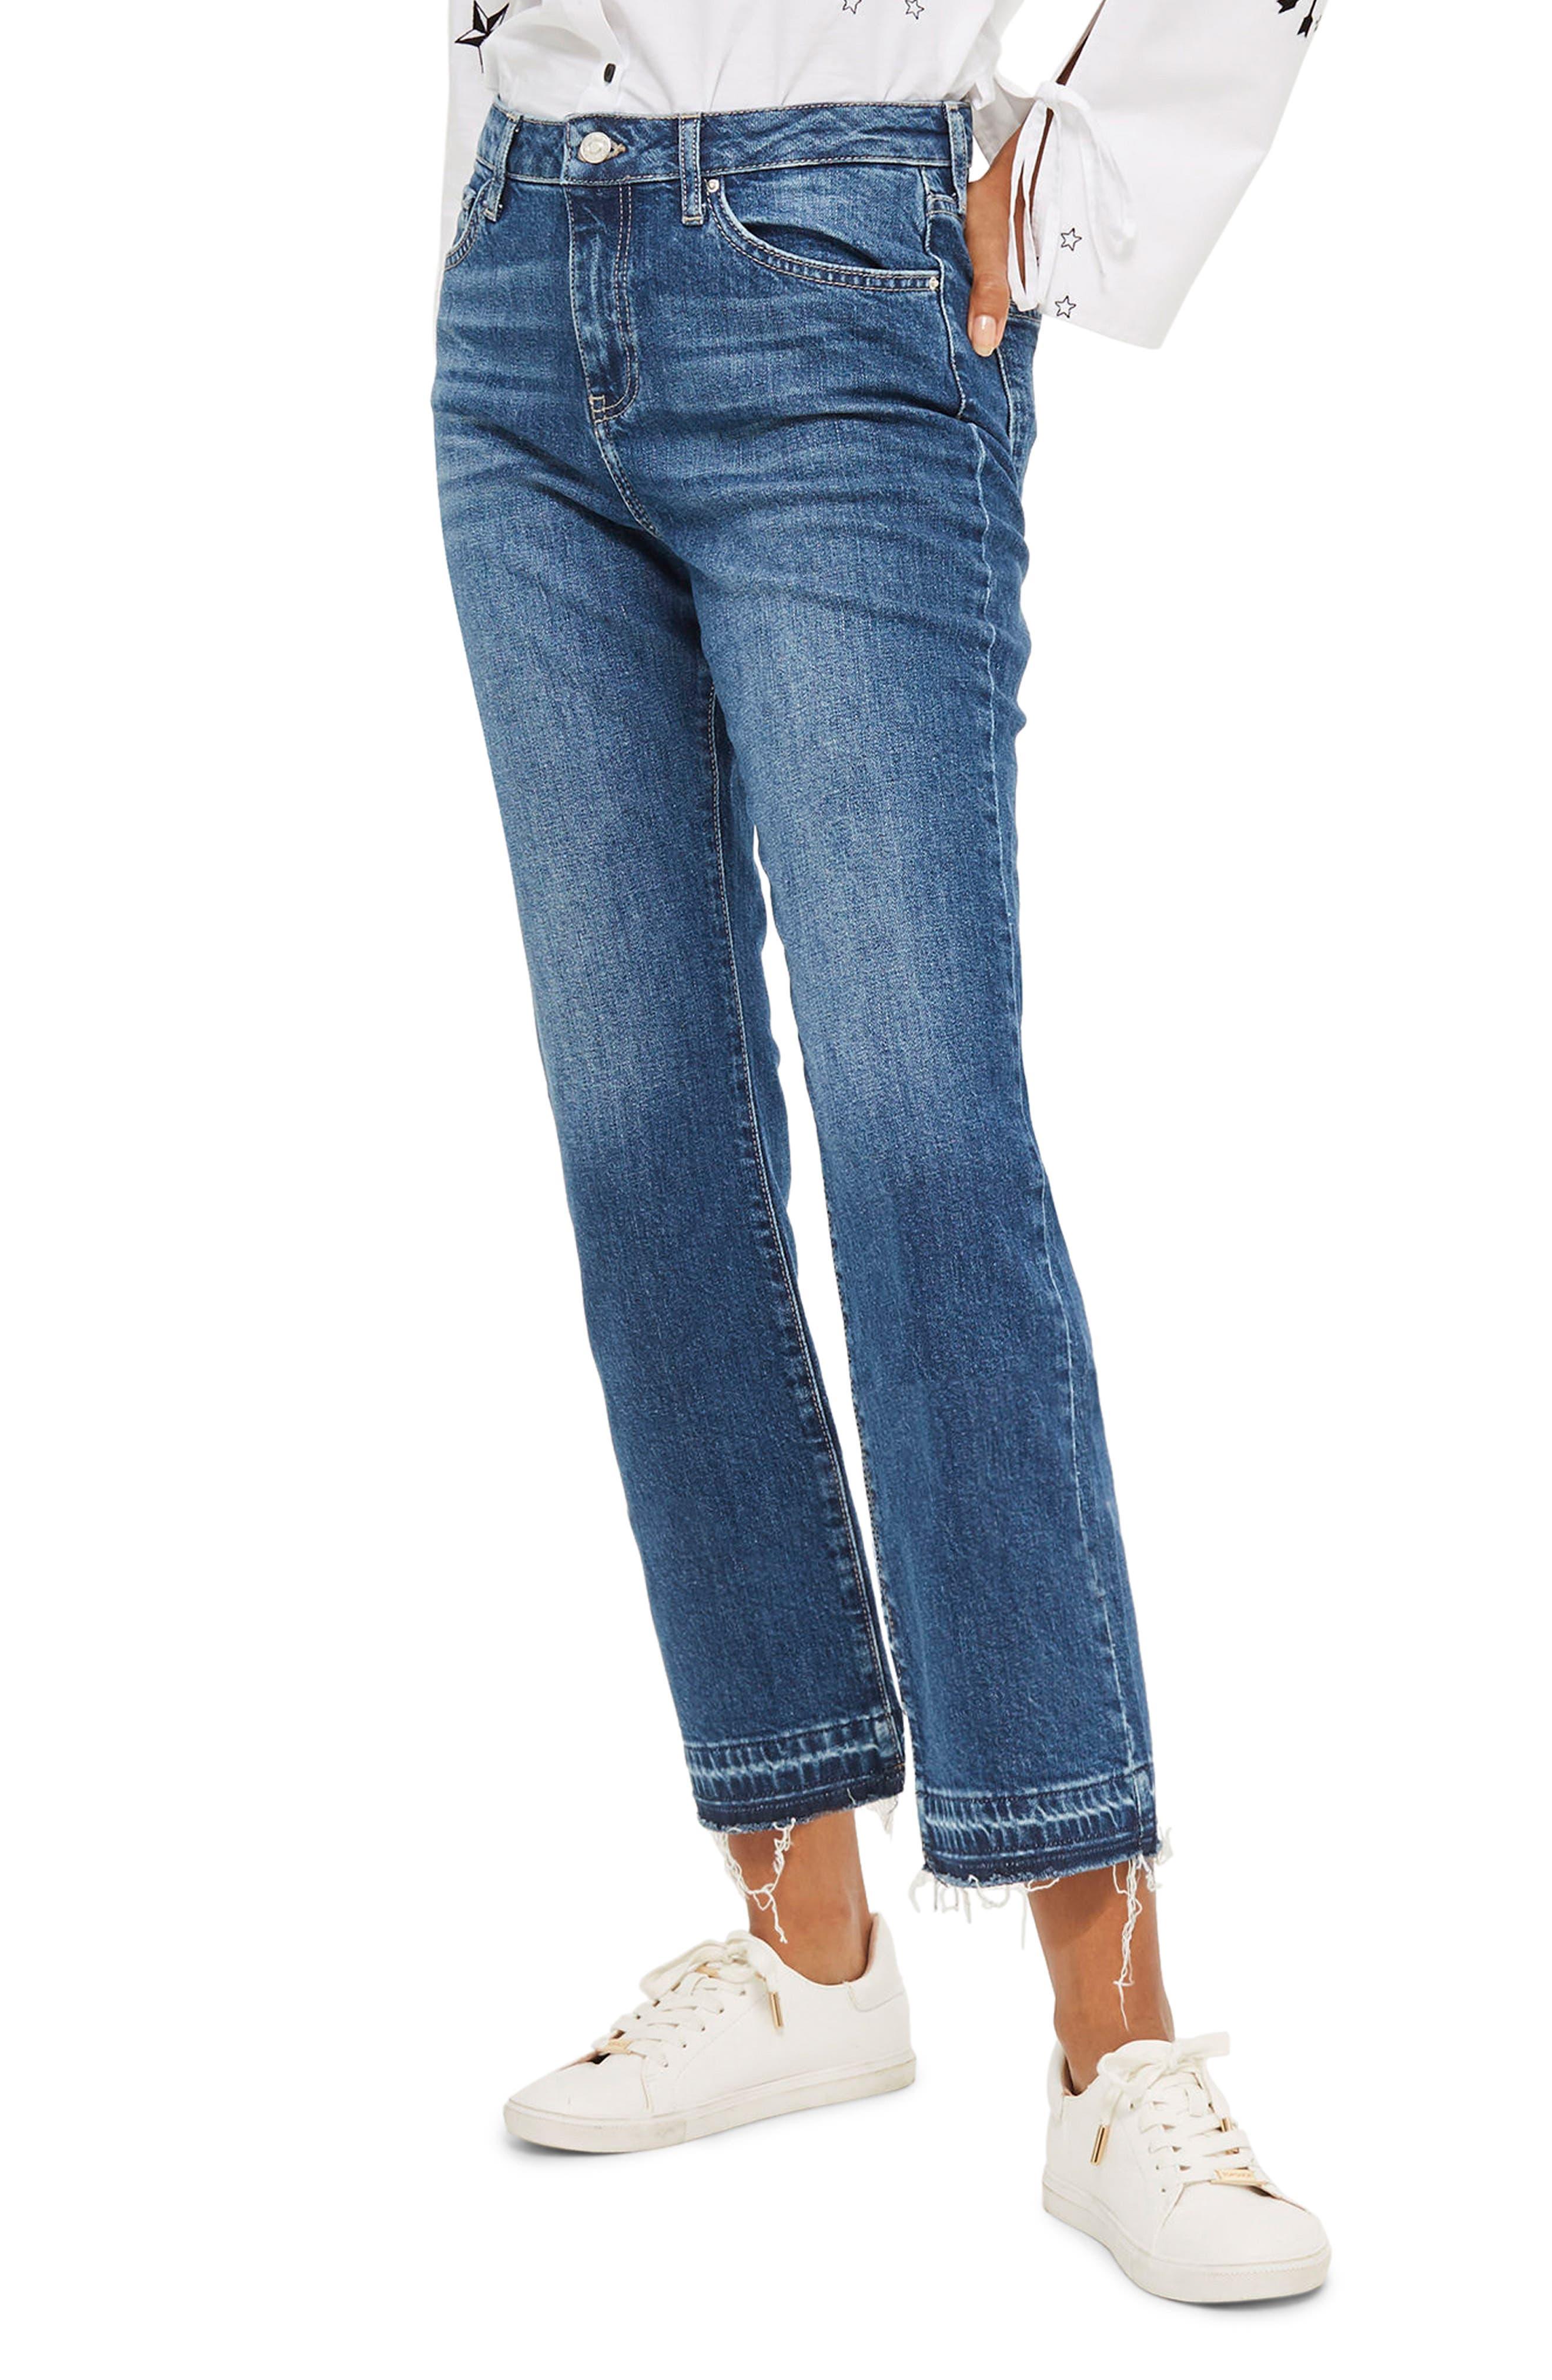 Alternate Image 1 Selected - Topshop Dree Released Hem Flare Jeans